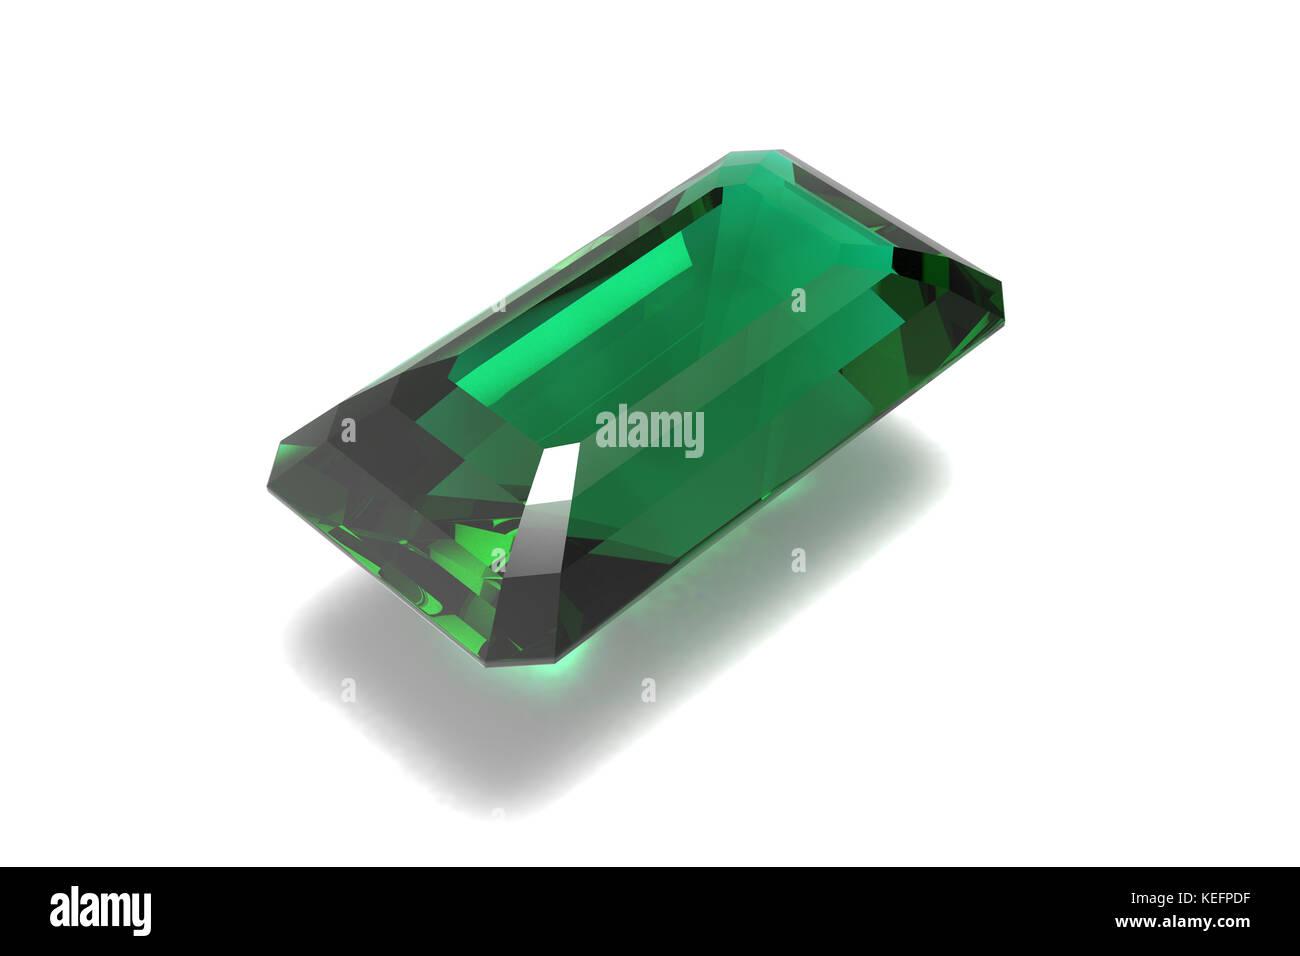 Emerald, Jewel, Gem - Stock Image